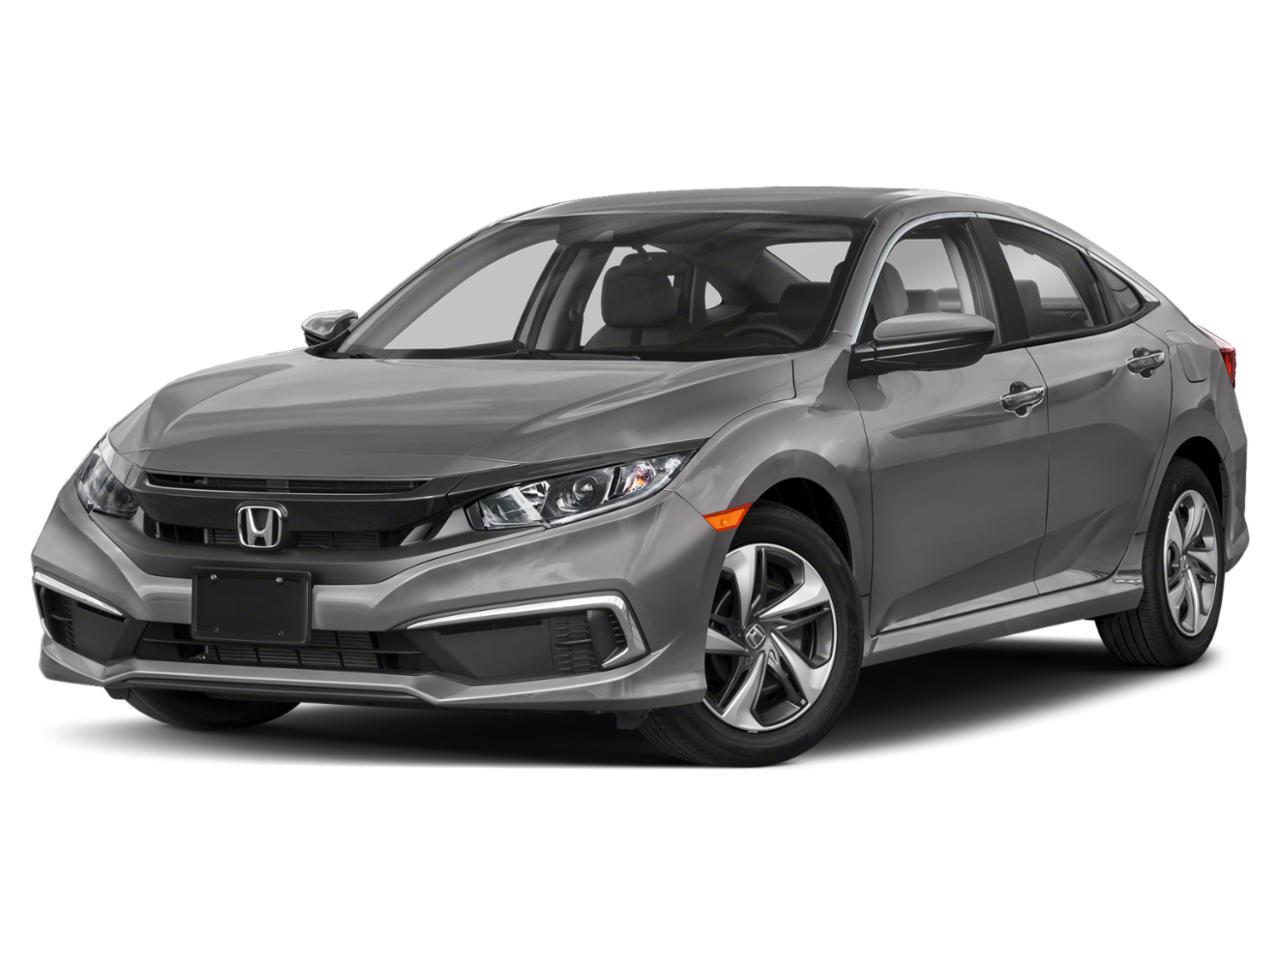 2019 Honda Civic Sedan Vehicle Photo in San Antonio, TX 78238